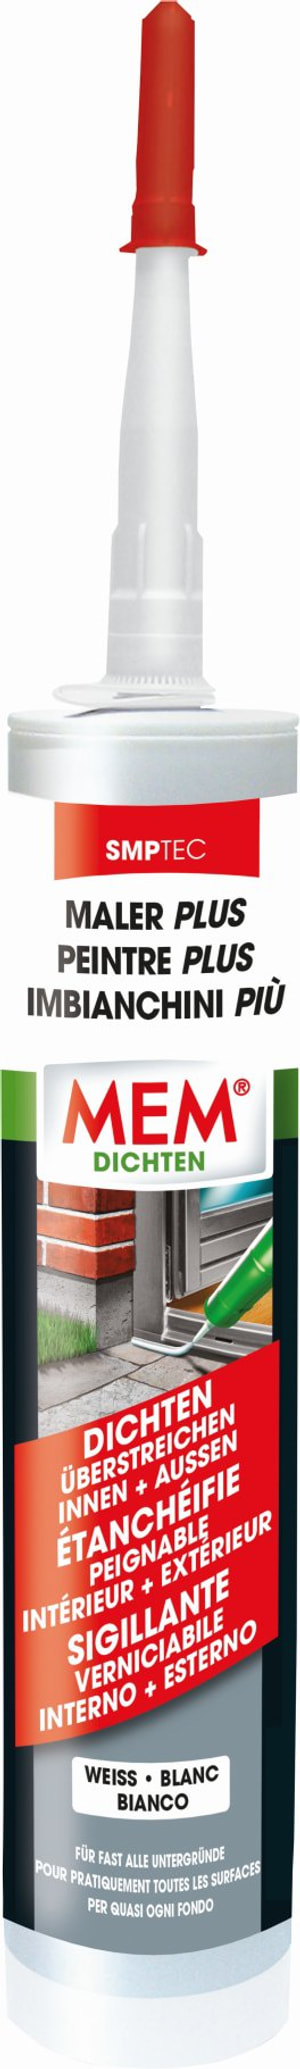 Maler Plus weiss, 290 ml